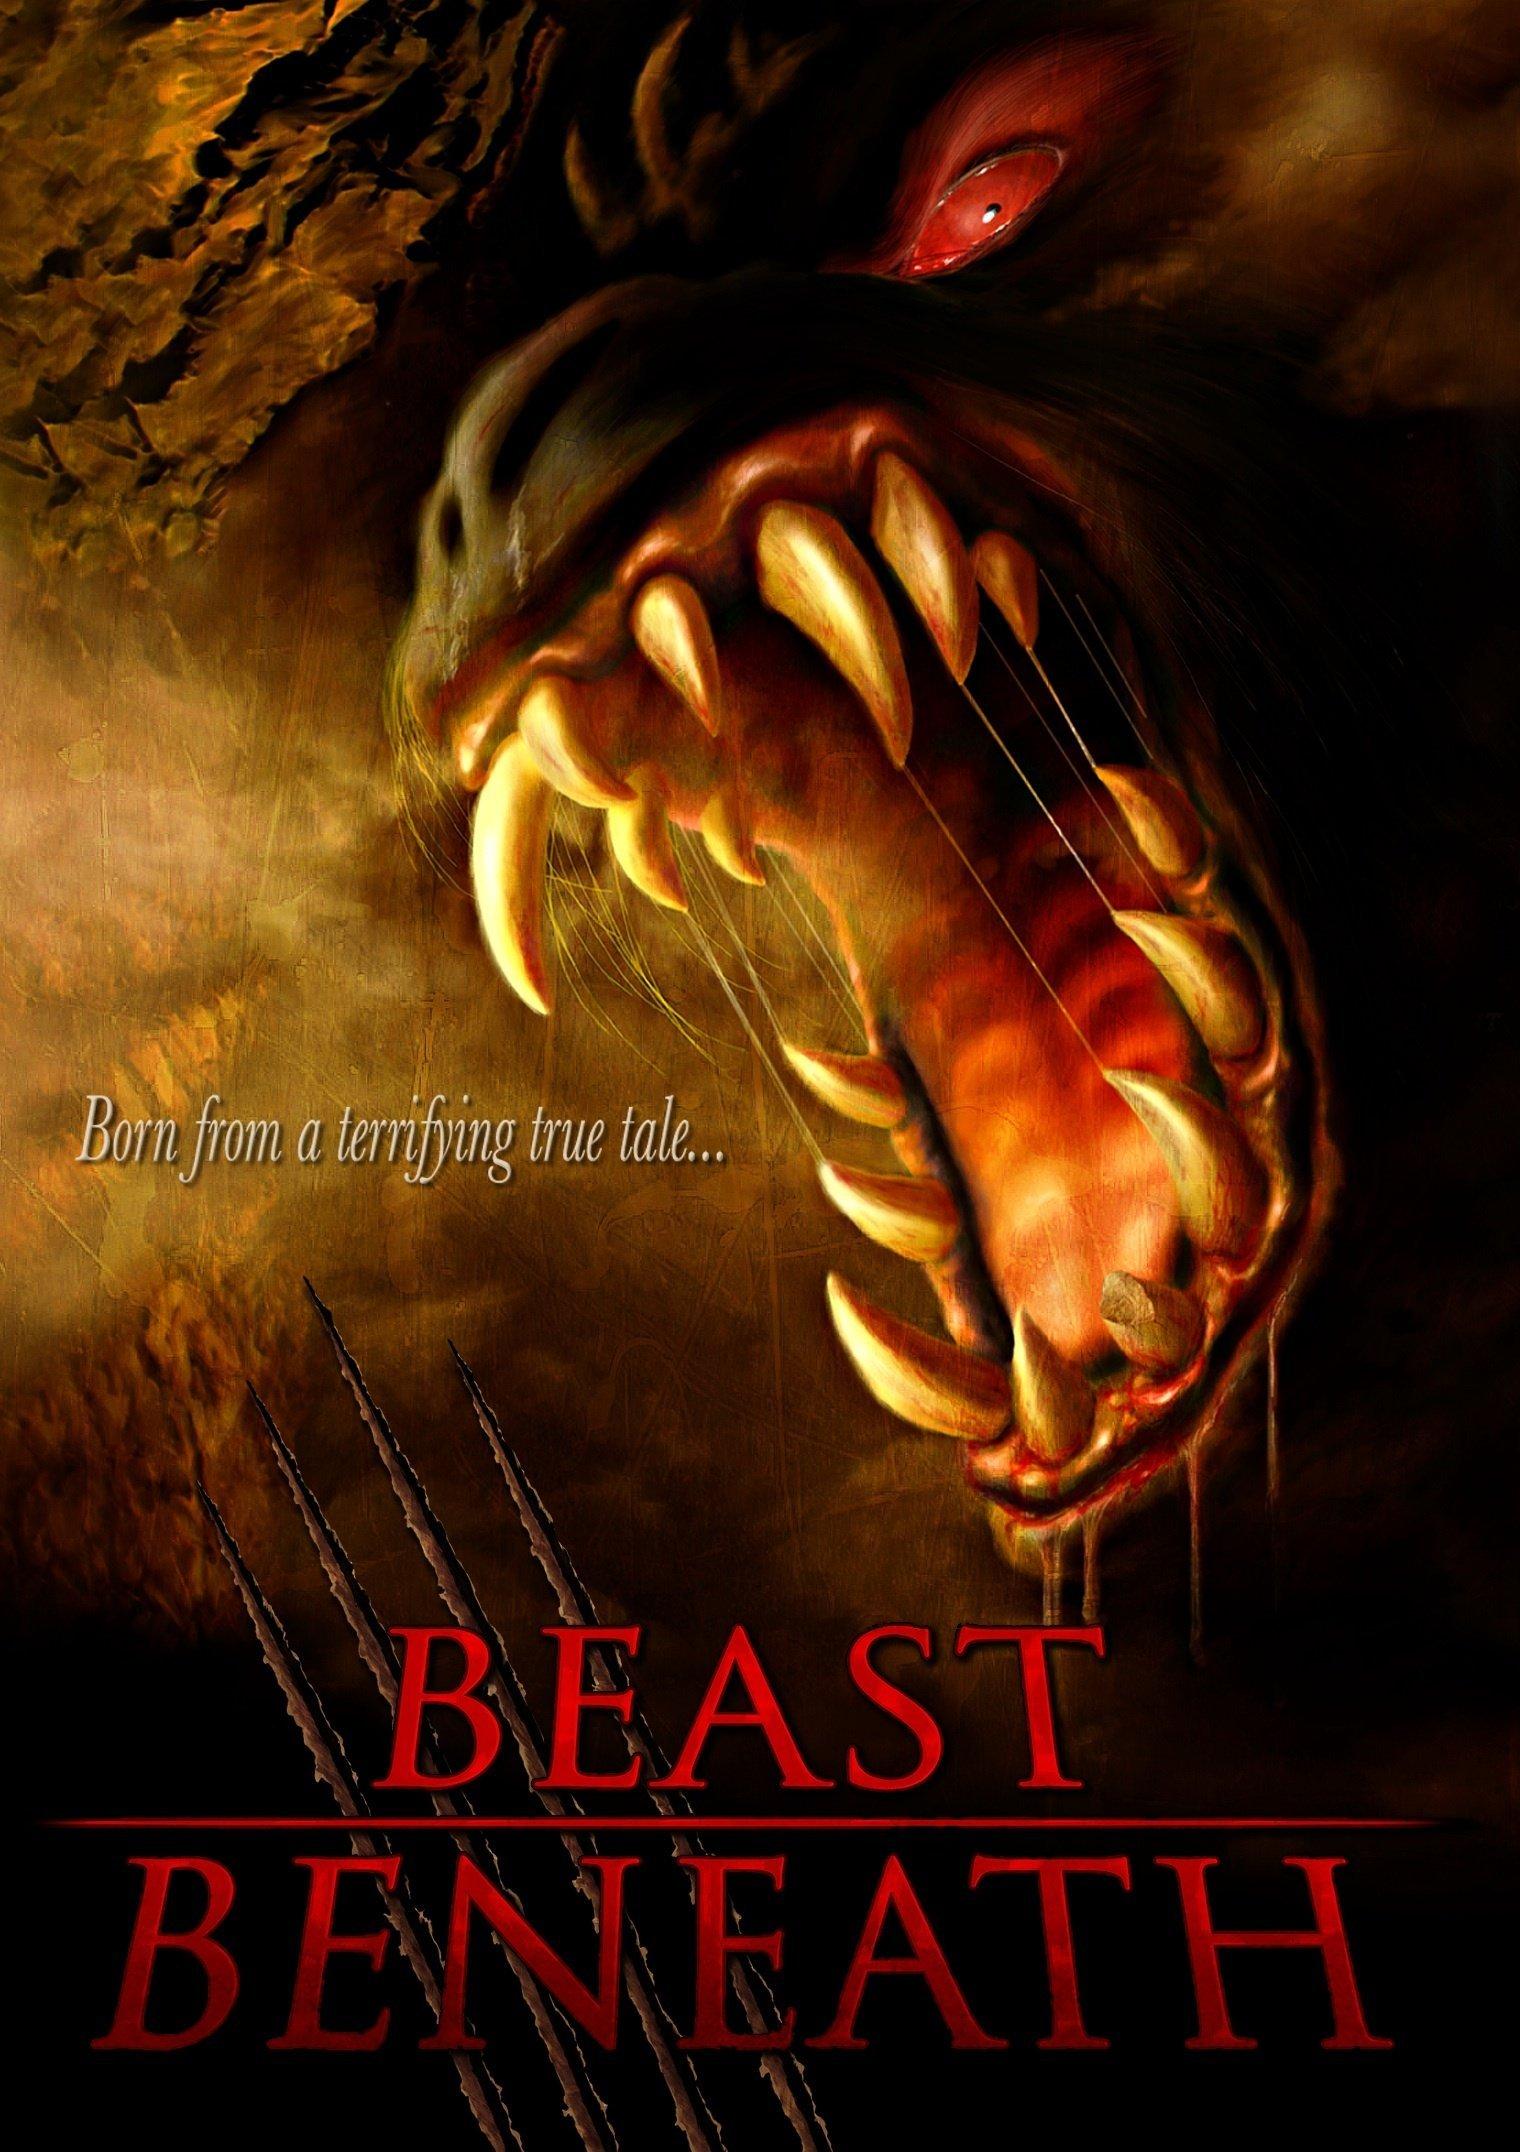 Beast beneath 2011 film cinemagia ro